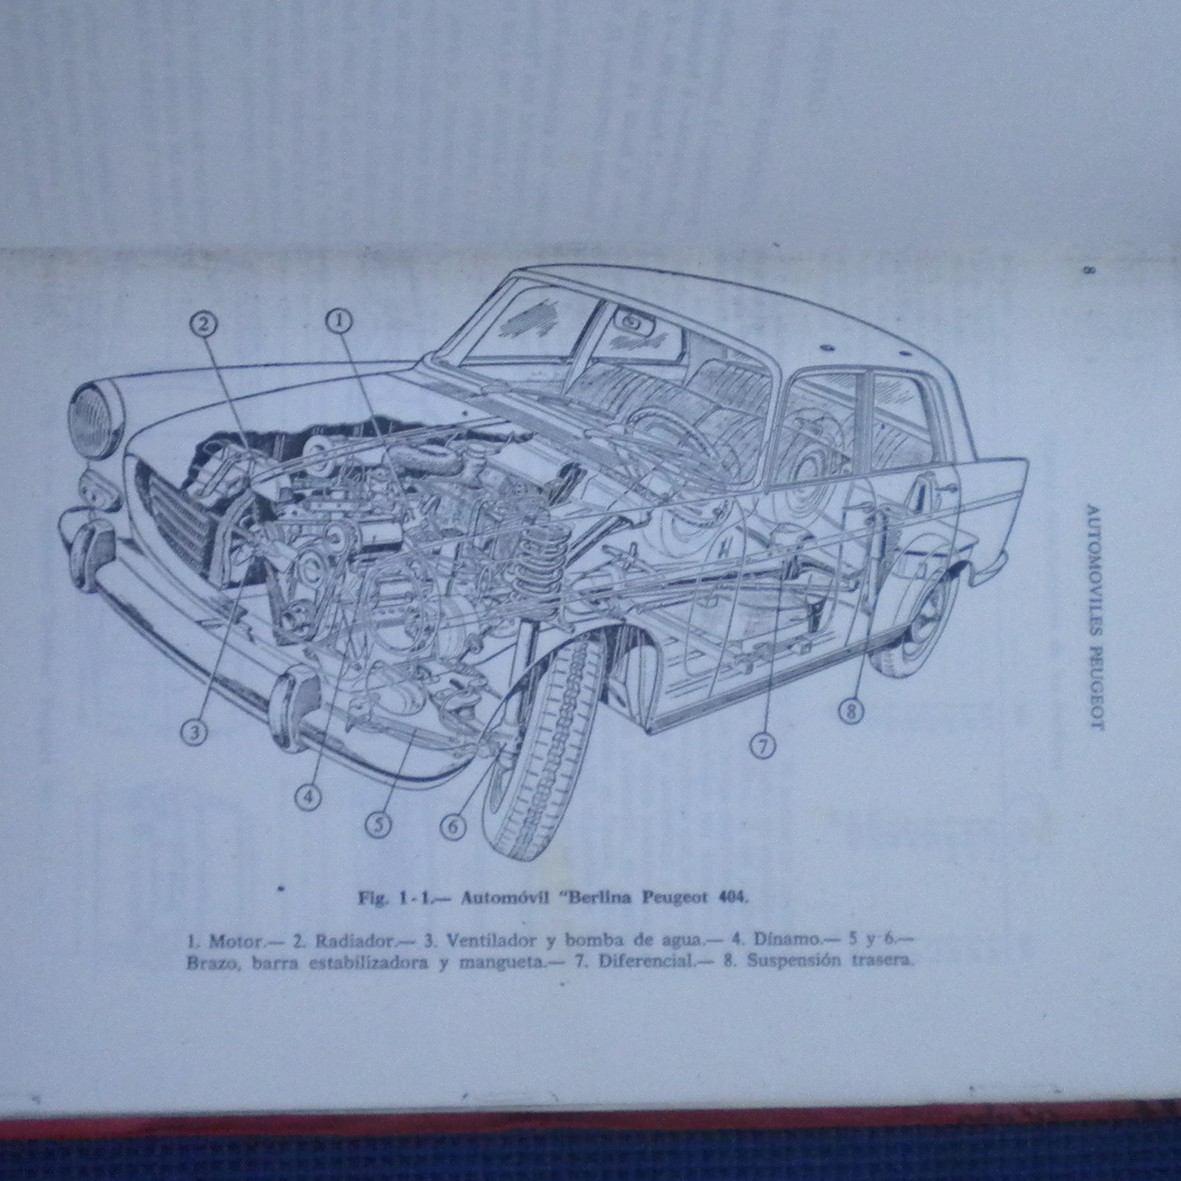 manual de taller peugeot 404 504 304 wenceslao varela 15 000 rh articulo mercadolibre cl Peugeot 406 Peugeot 707